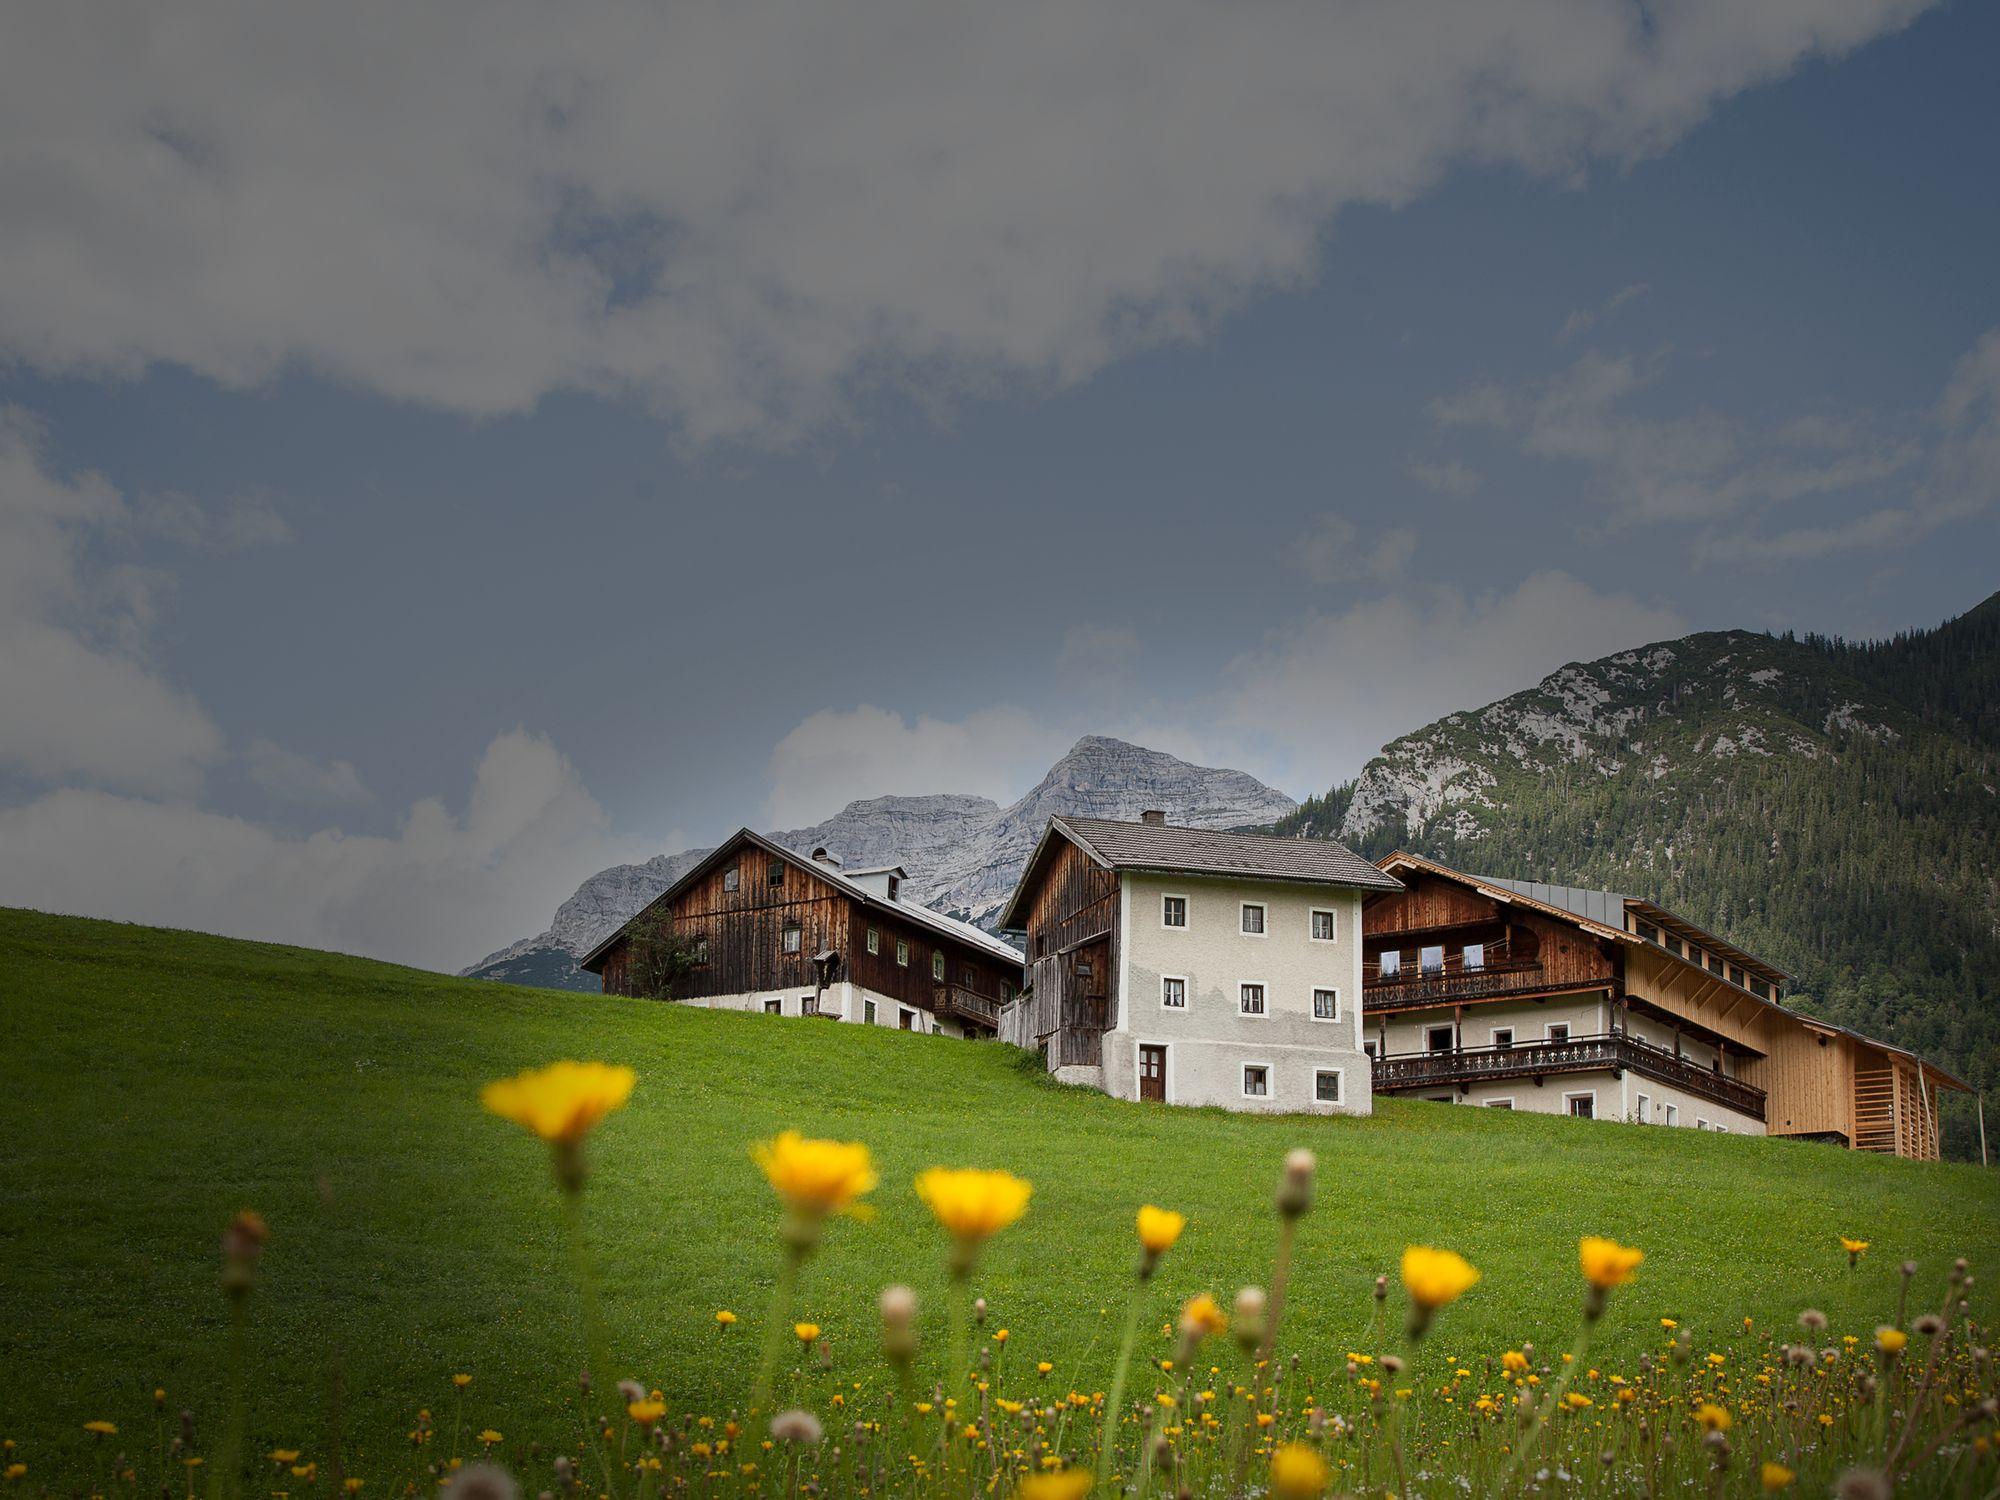 Mesnerhof-C Tirol Sommer